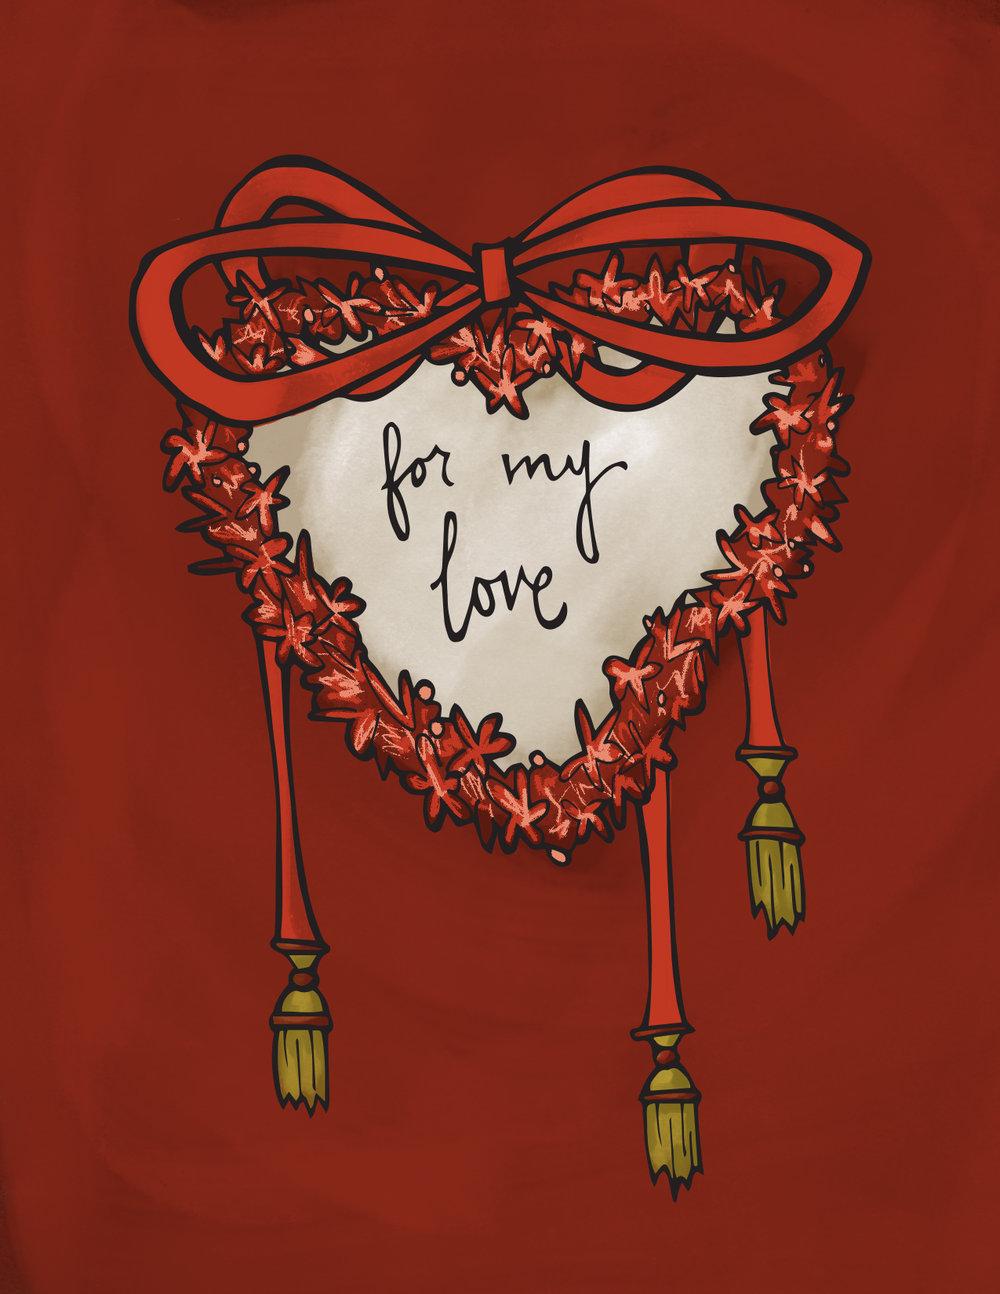 For my Love.jpg